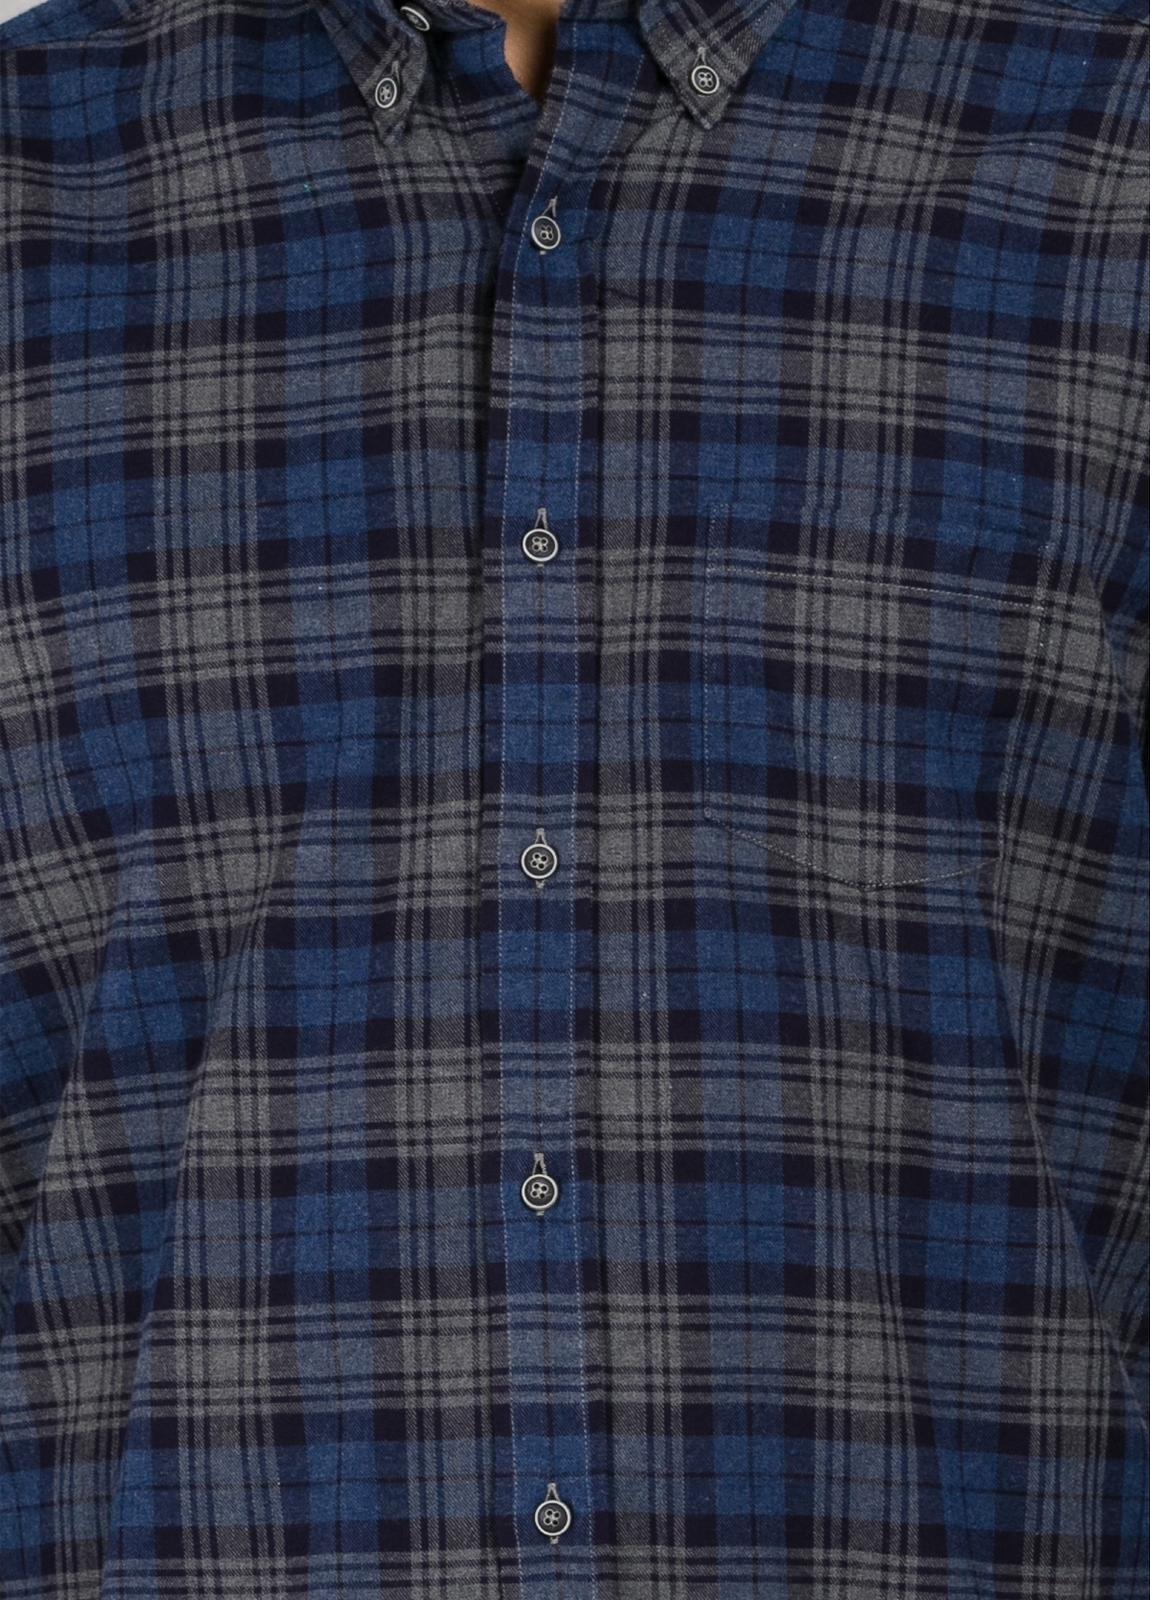 Camisa Leisure Wear REGULAR FIT Modelo BOTTON DOWN cuadros color azul marino. 100% Algodón. - Ítem2